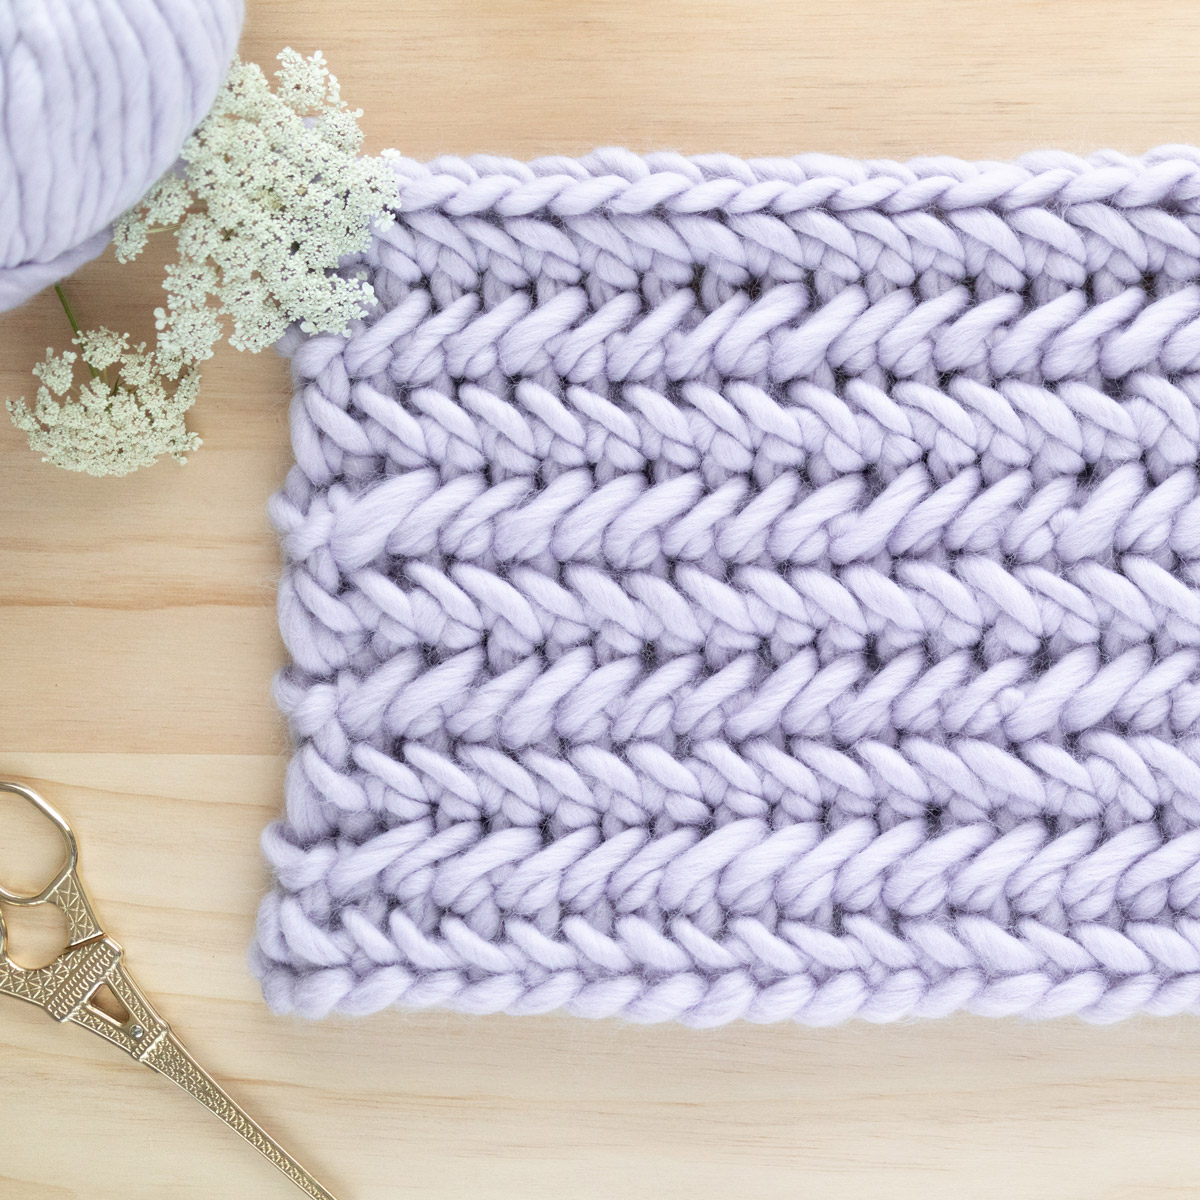 Herringbone Single Crochet Stitch Tutorial - For The Frills Crochetherringbonestitch - Crochet Tutorial